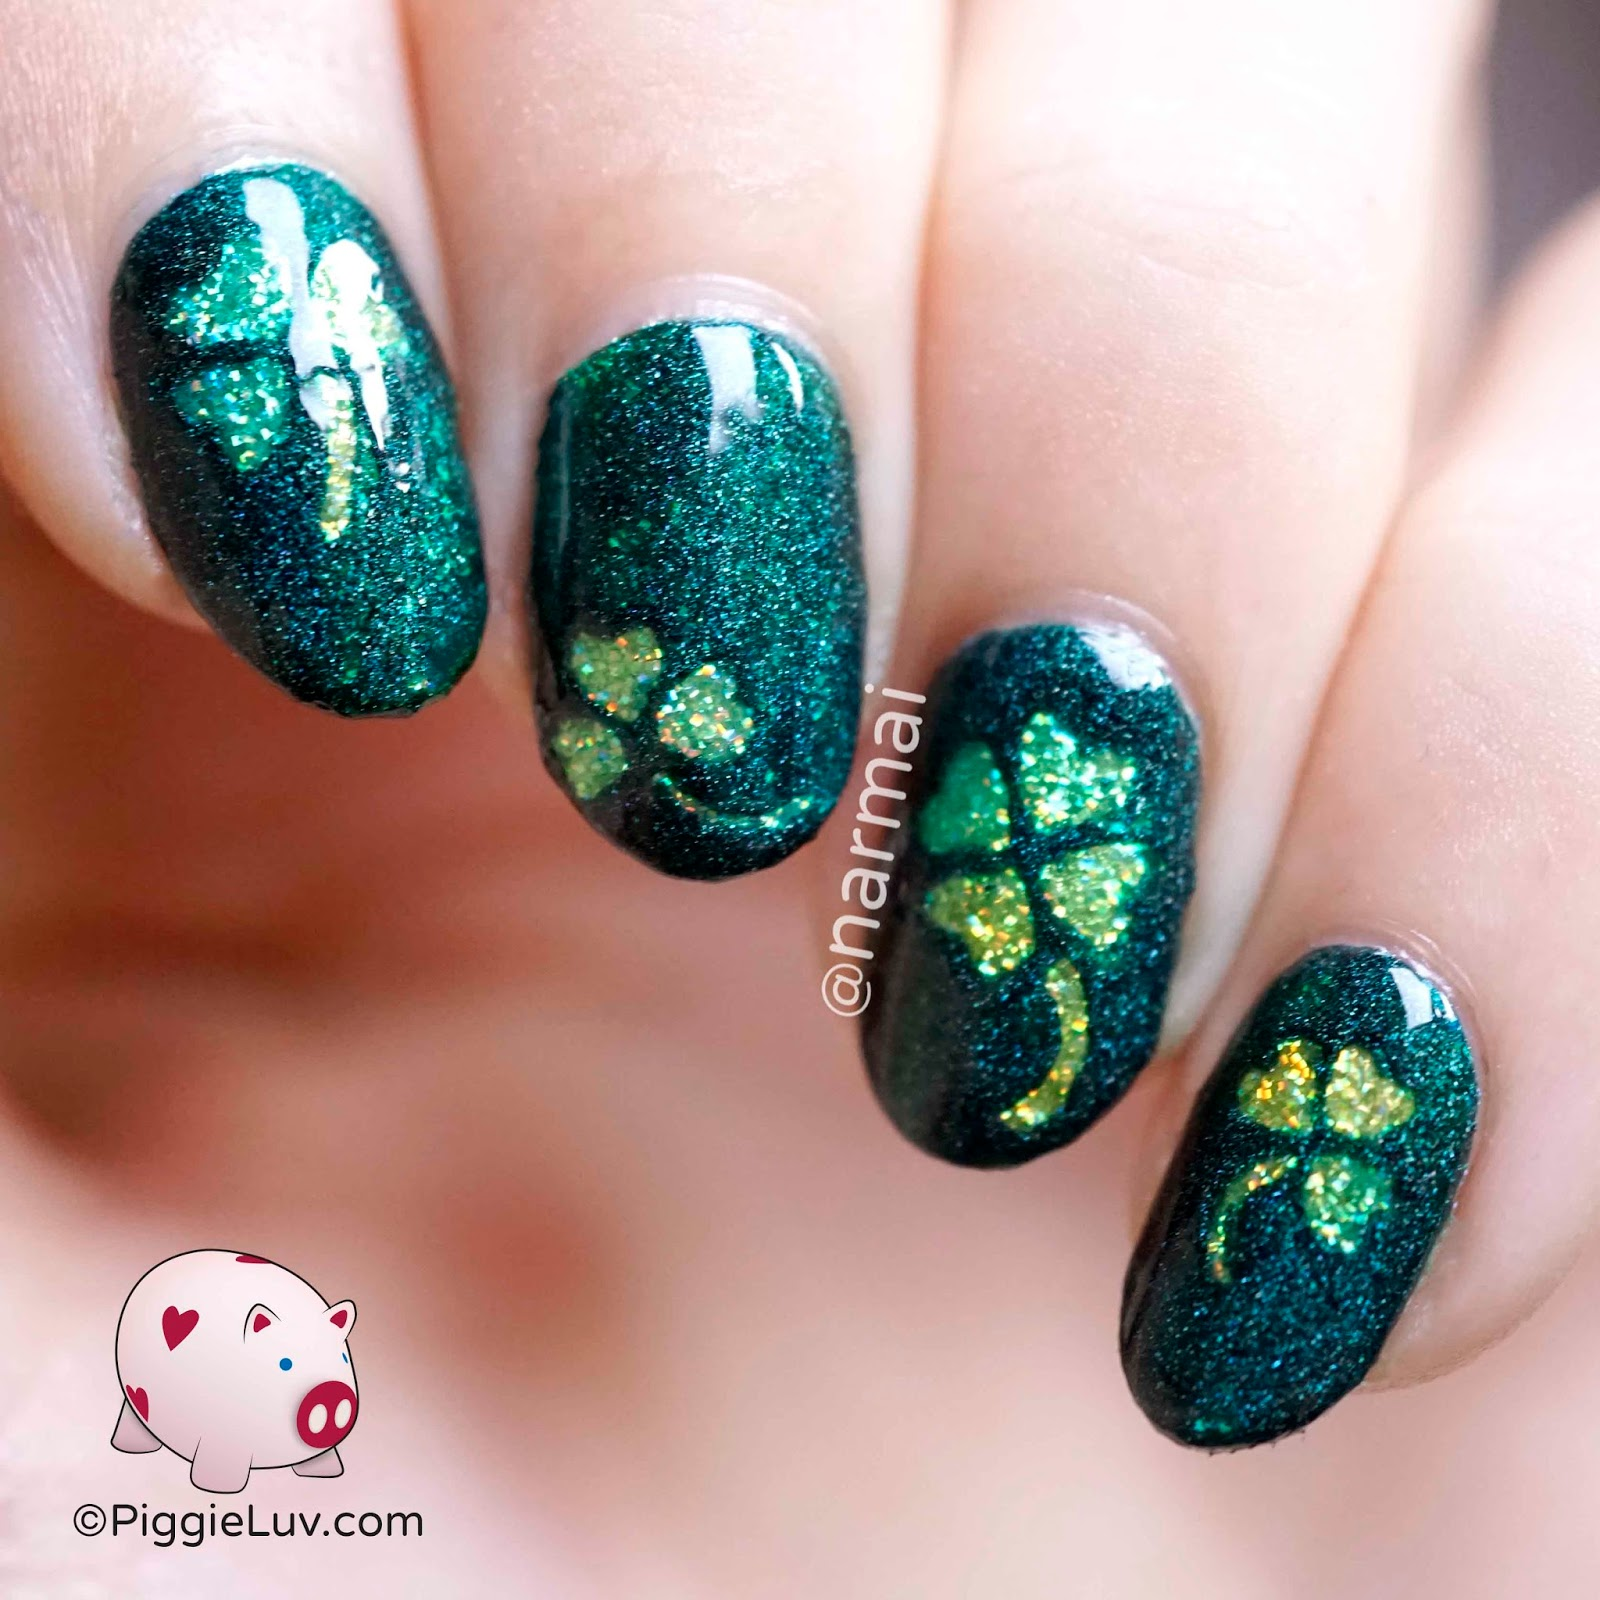 PiggieLuv: Glitter shamrocks nail art for St. Patrick\'s Day + giveaway